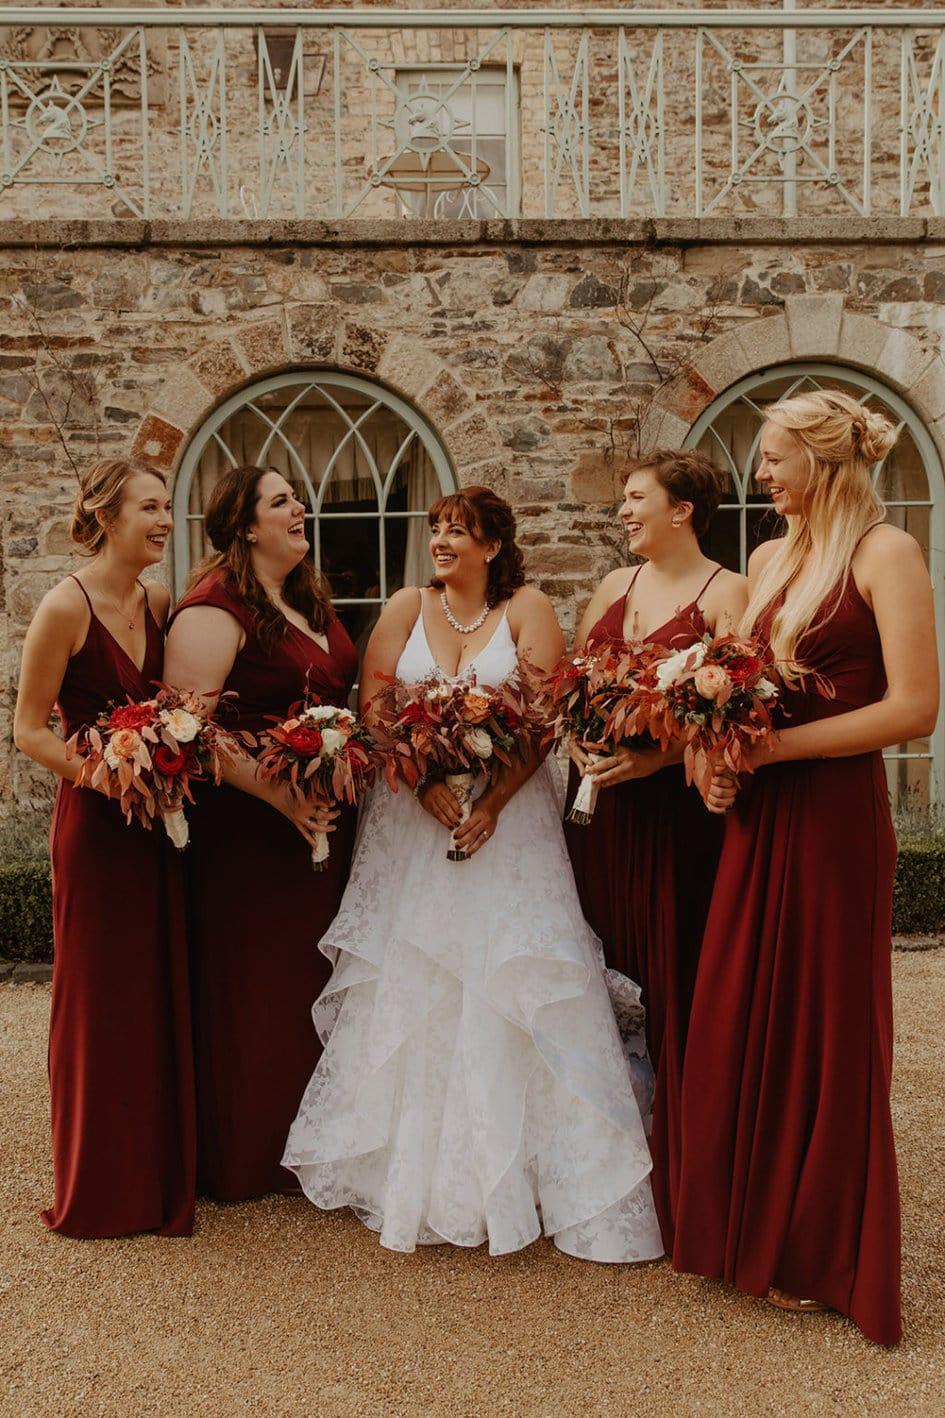 Bruidsmeisjes dragen rood op de bruiloft